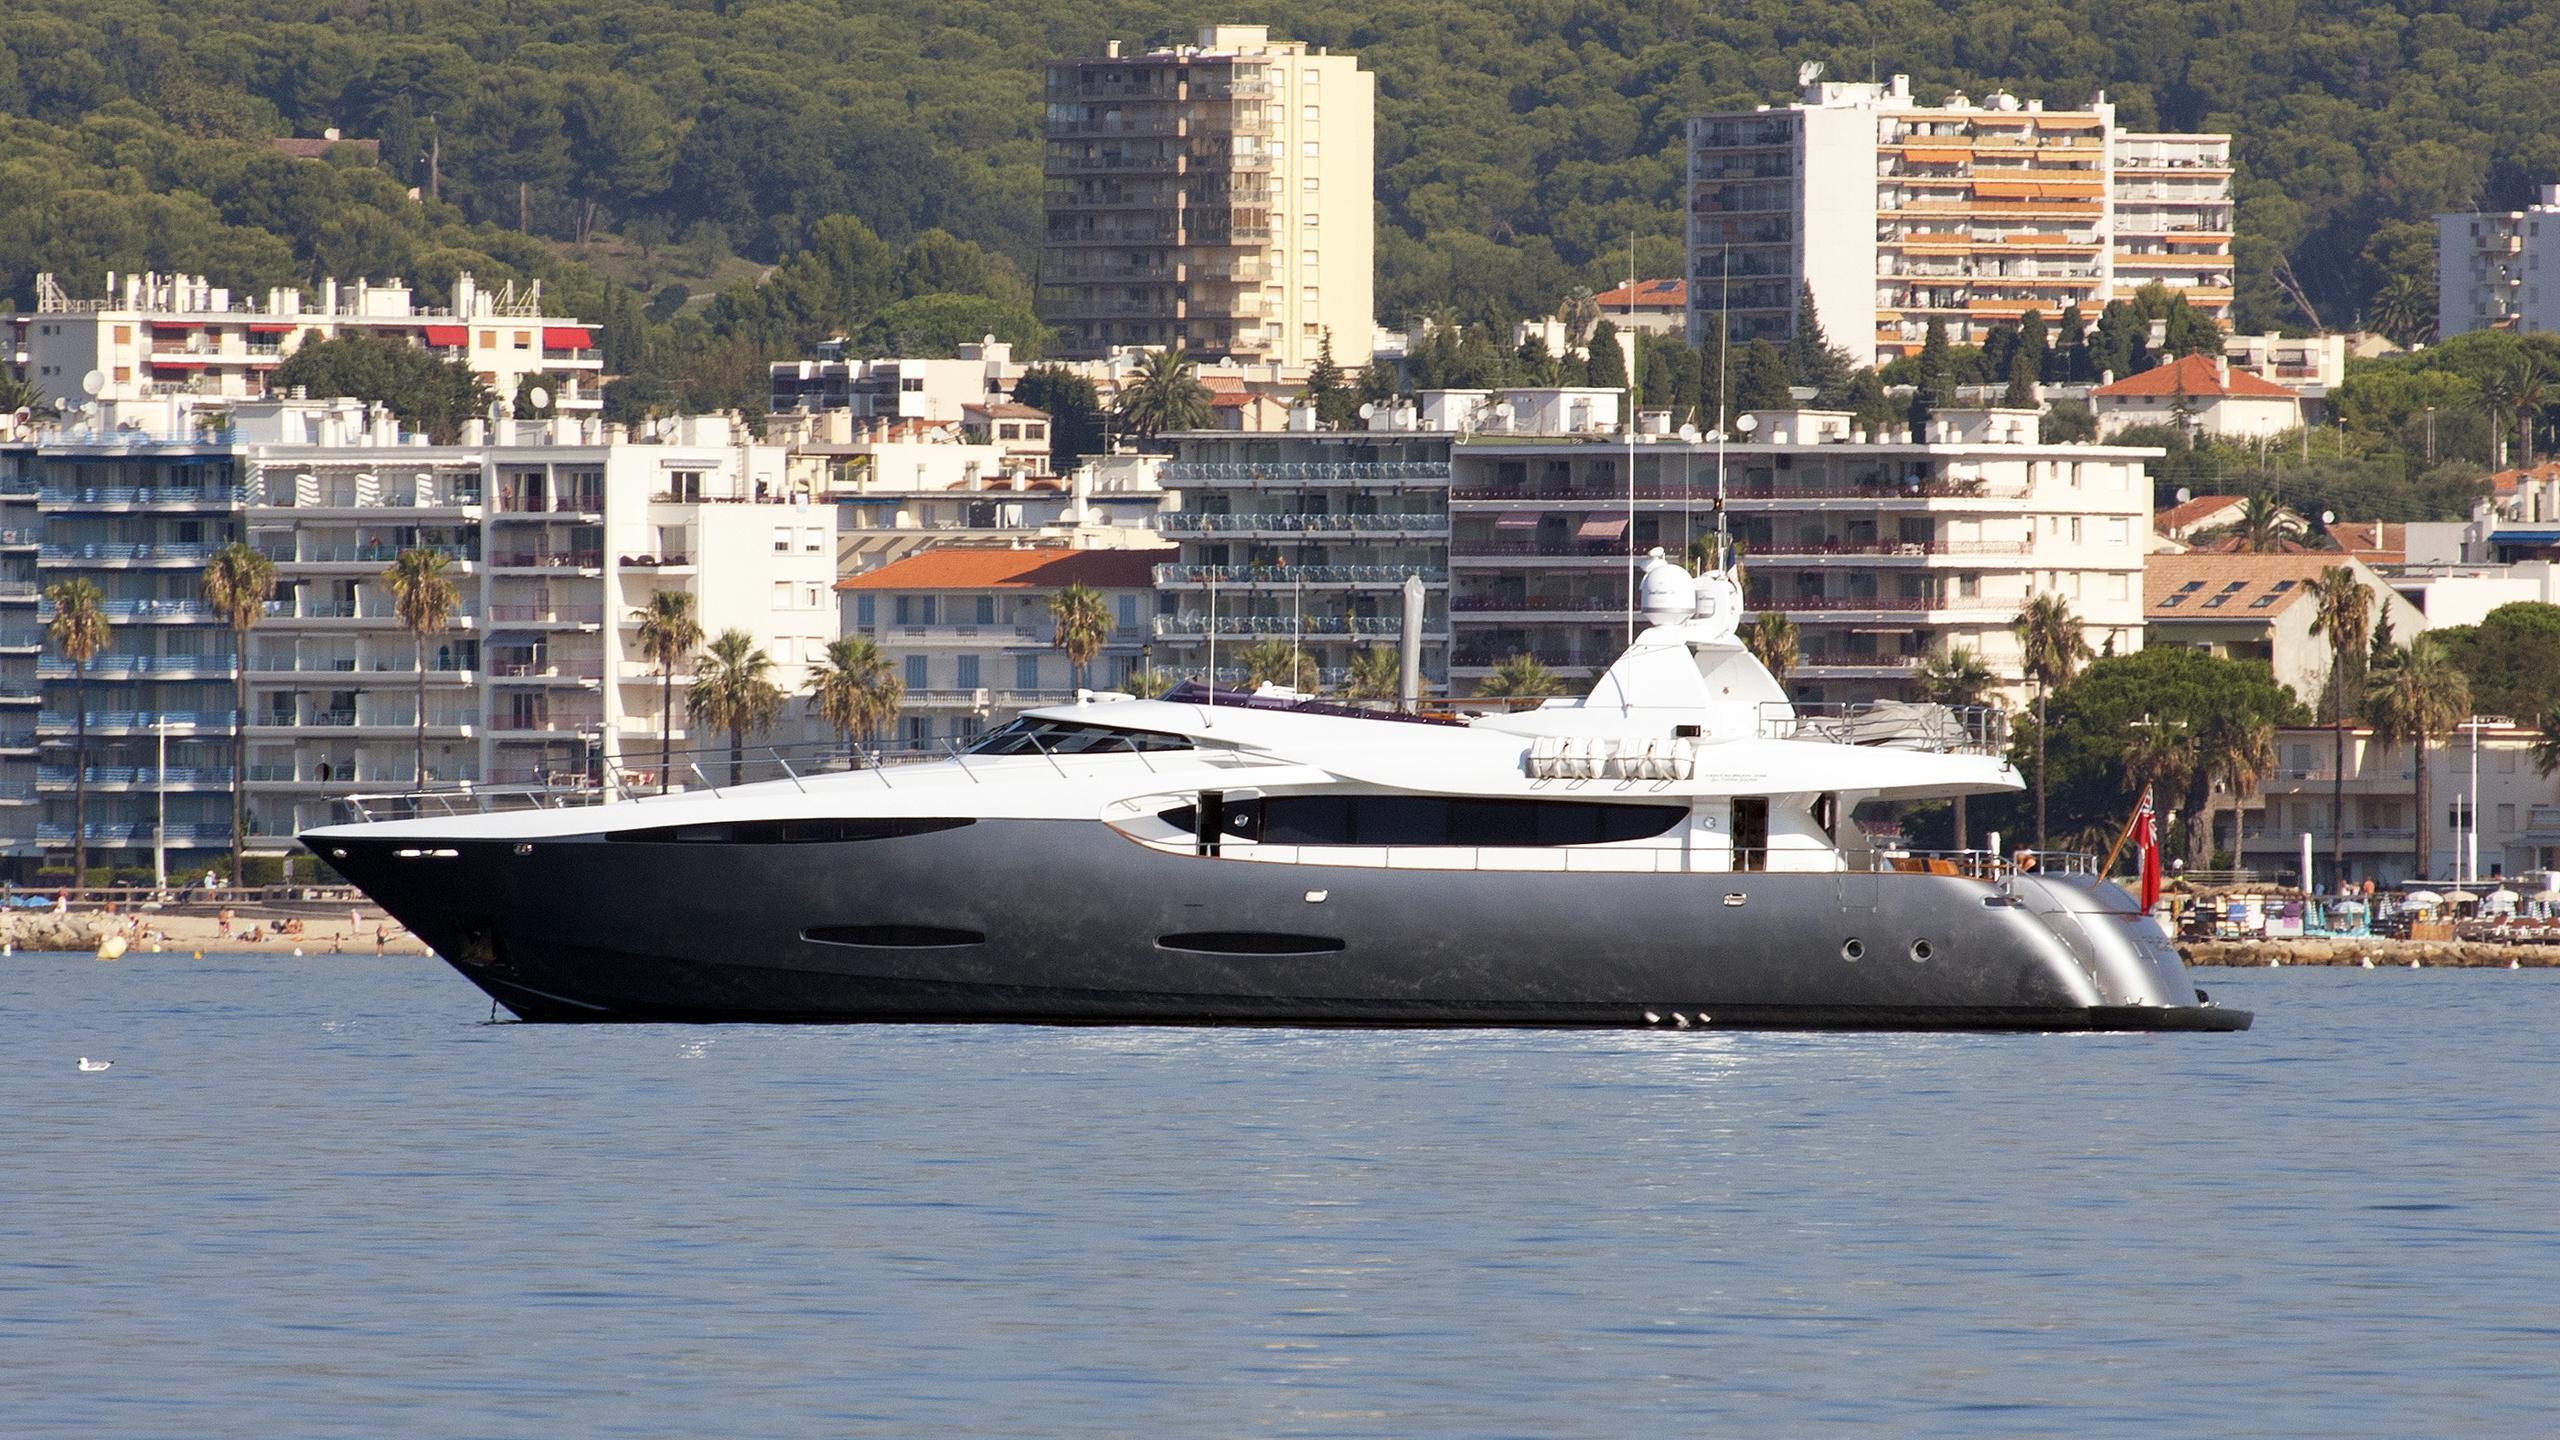 new-vogue-motor-yacht-peri-2007-31m-profile